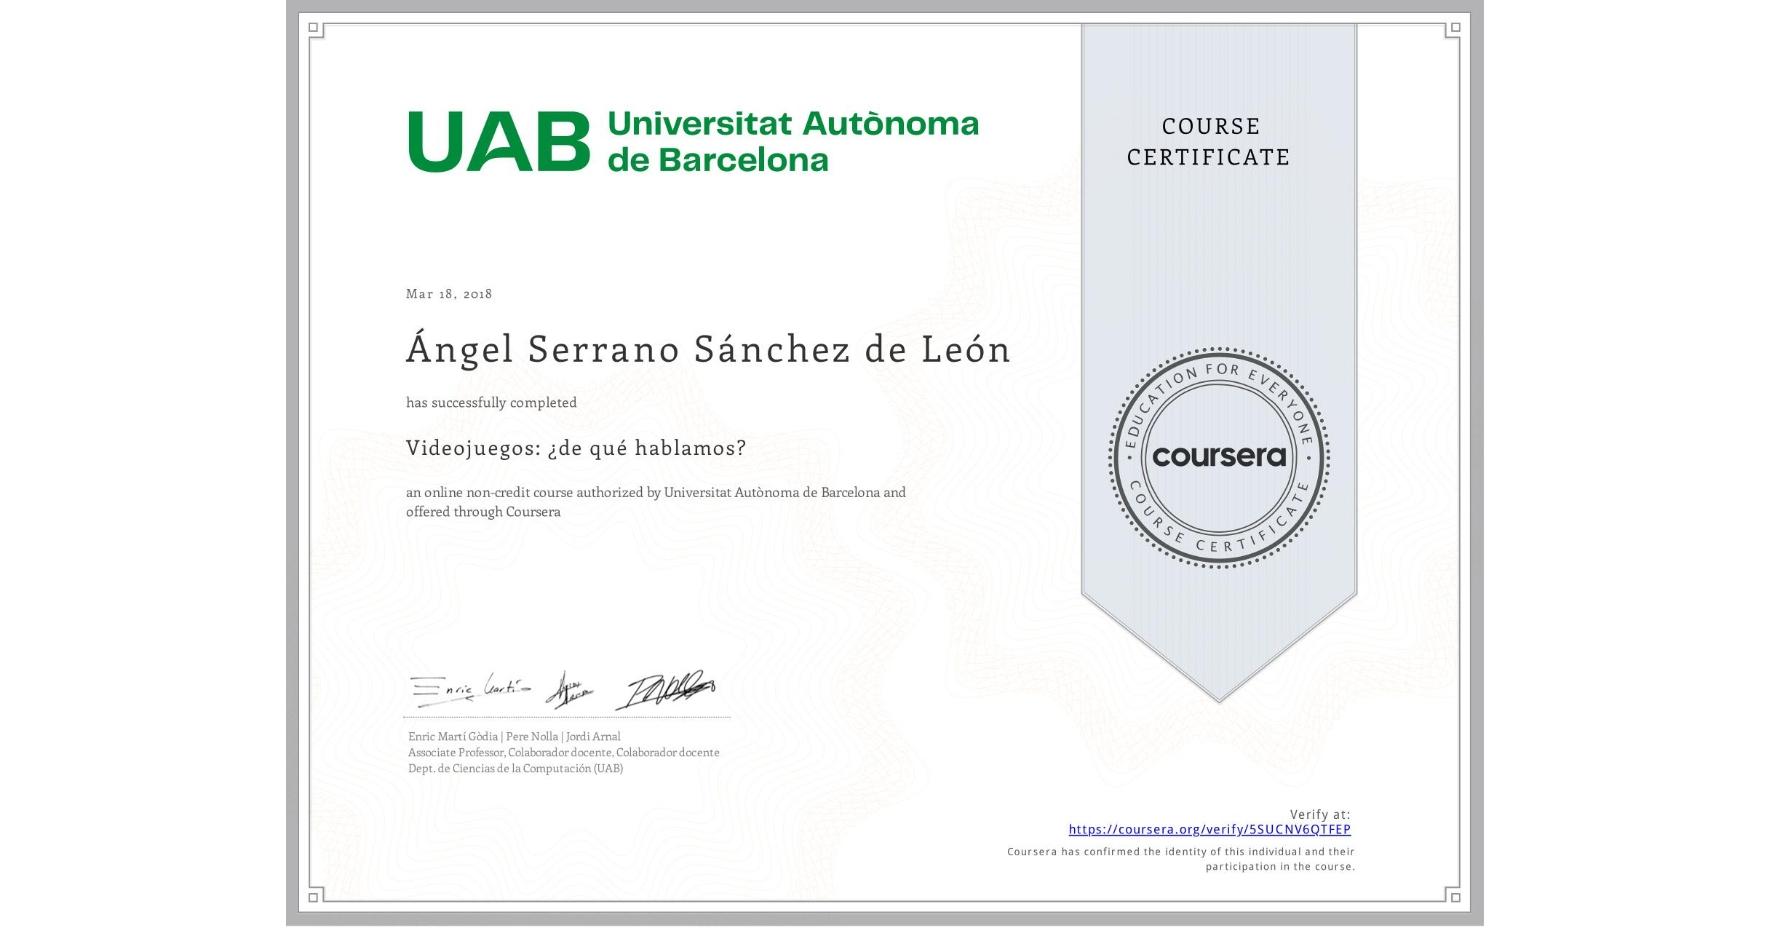 View certificate for Ángel Serrano Sánchez de León, Videojuegos: ¿de qué hablamos?, an online non-credit course authorized by Universitat Autònoma de Barcelona and offered through Coursera